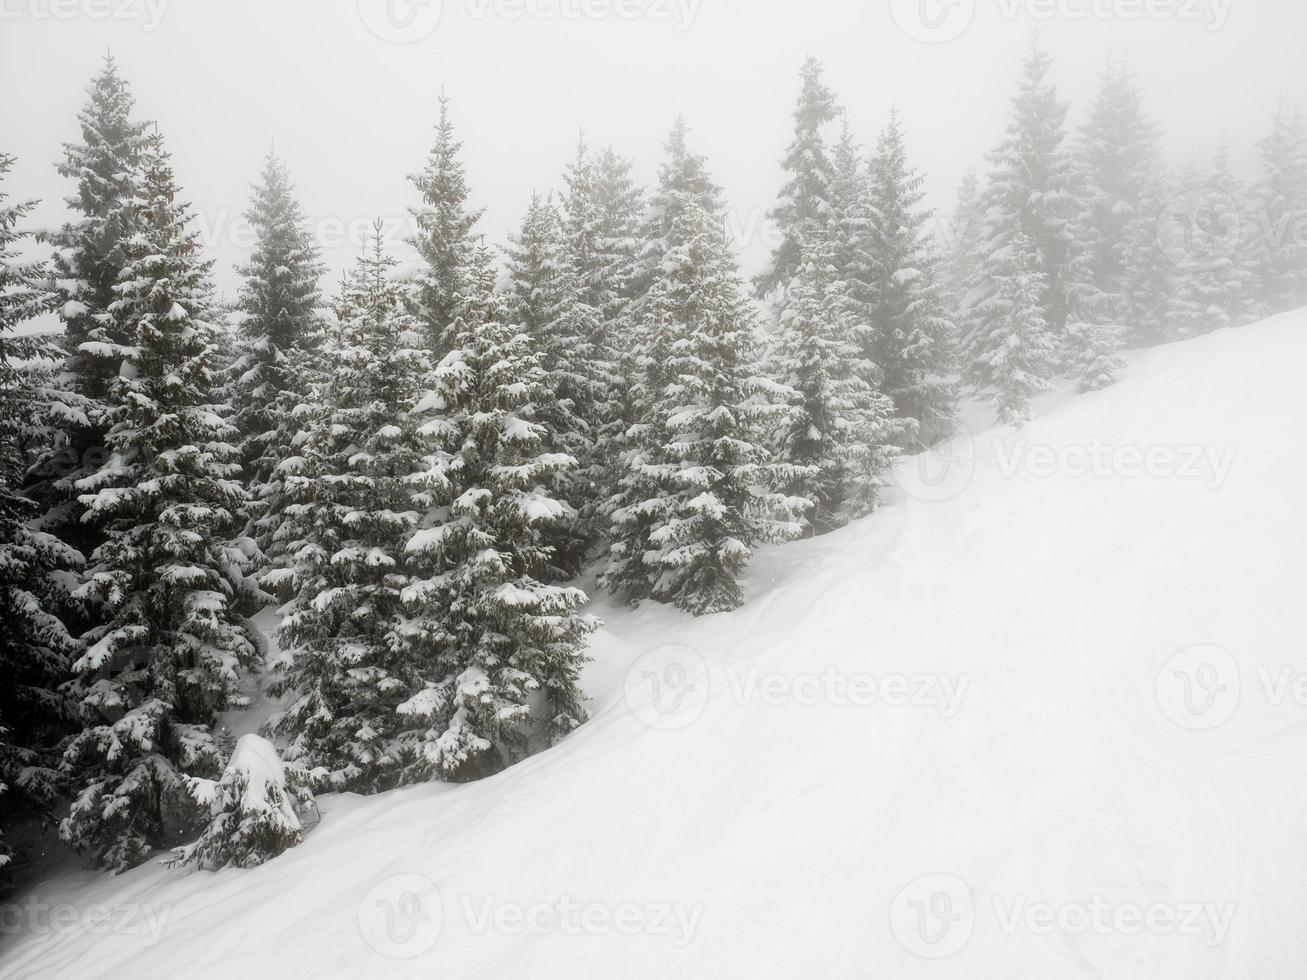 árvores cobertas de neve na névoa foto